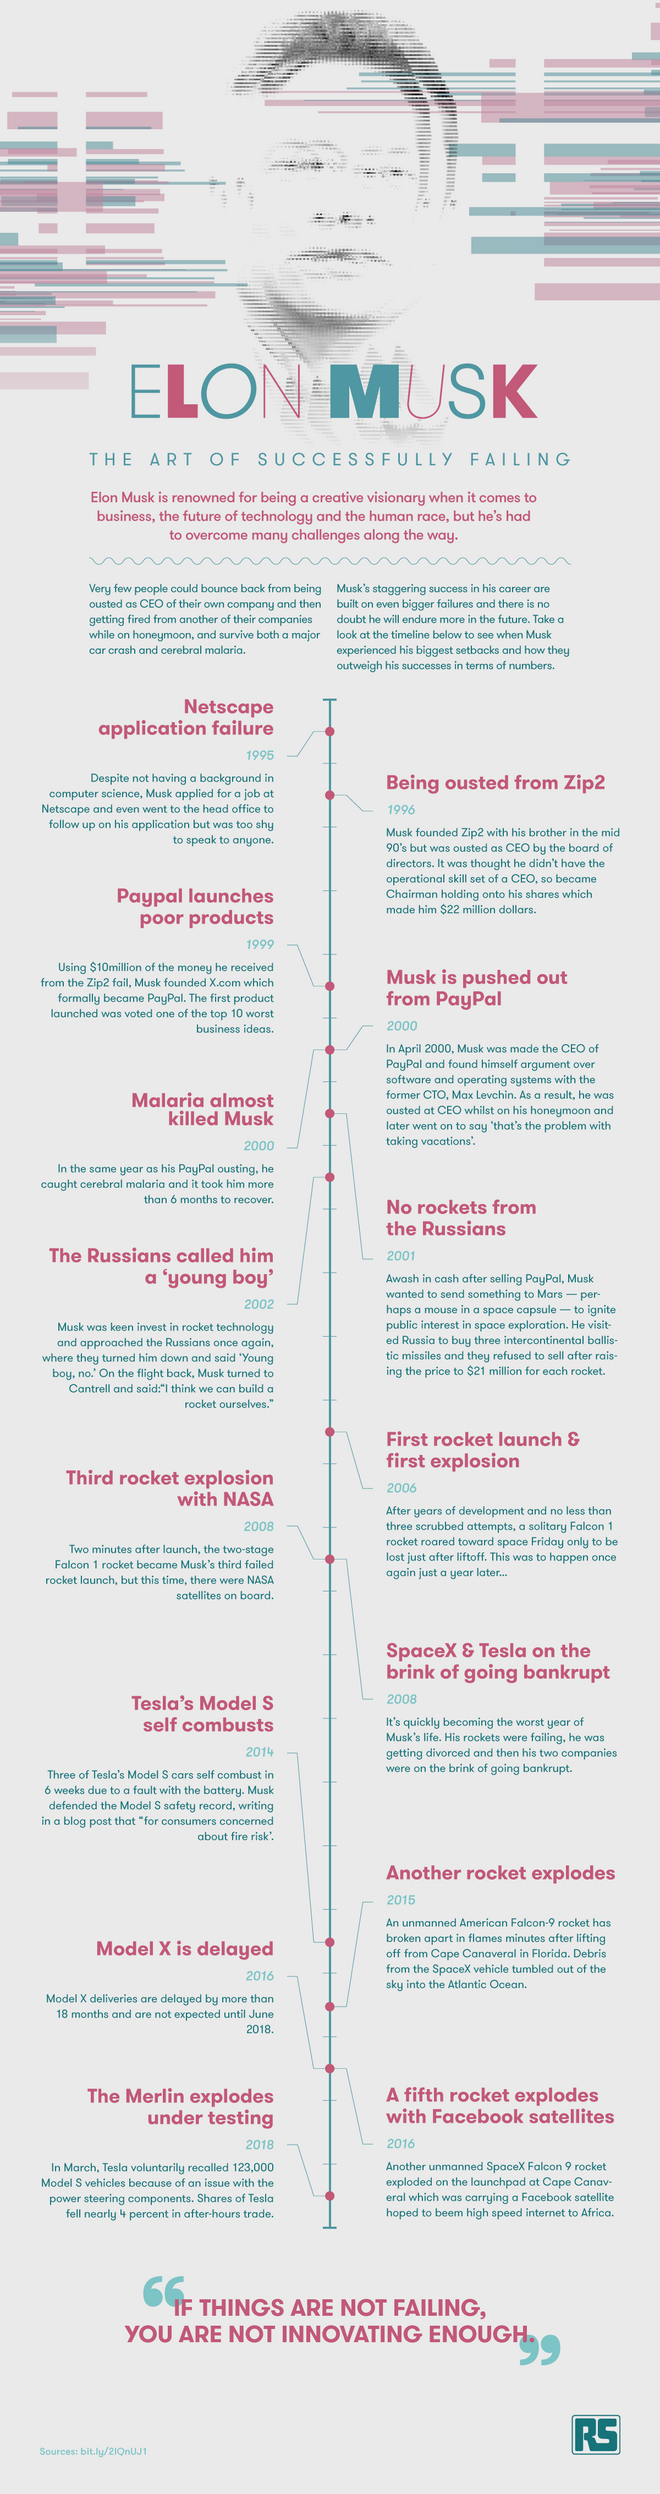 elon-musk-infographic